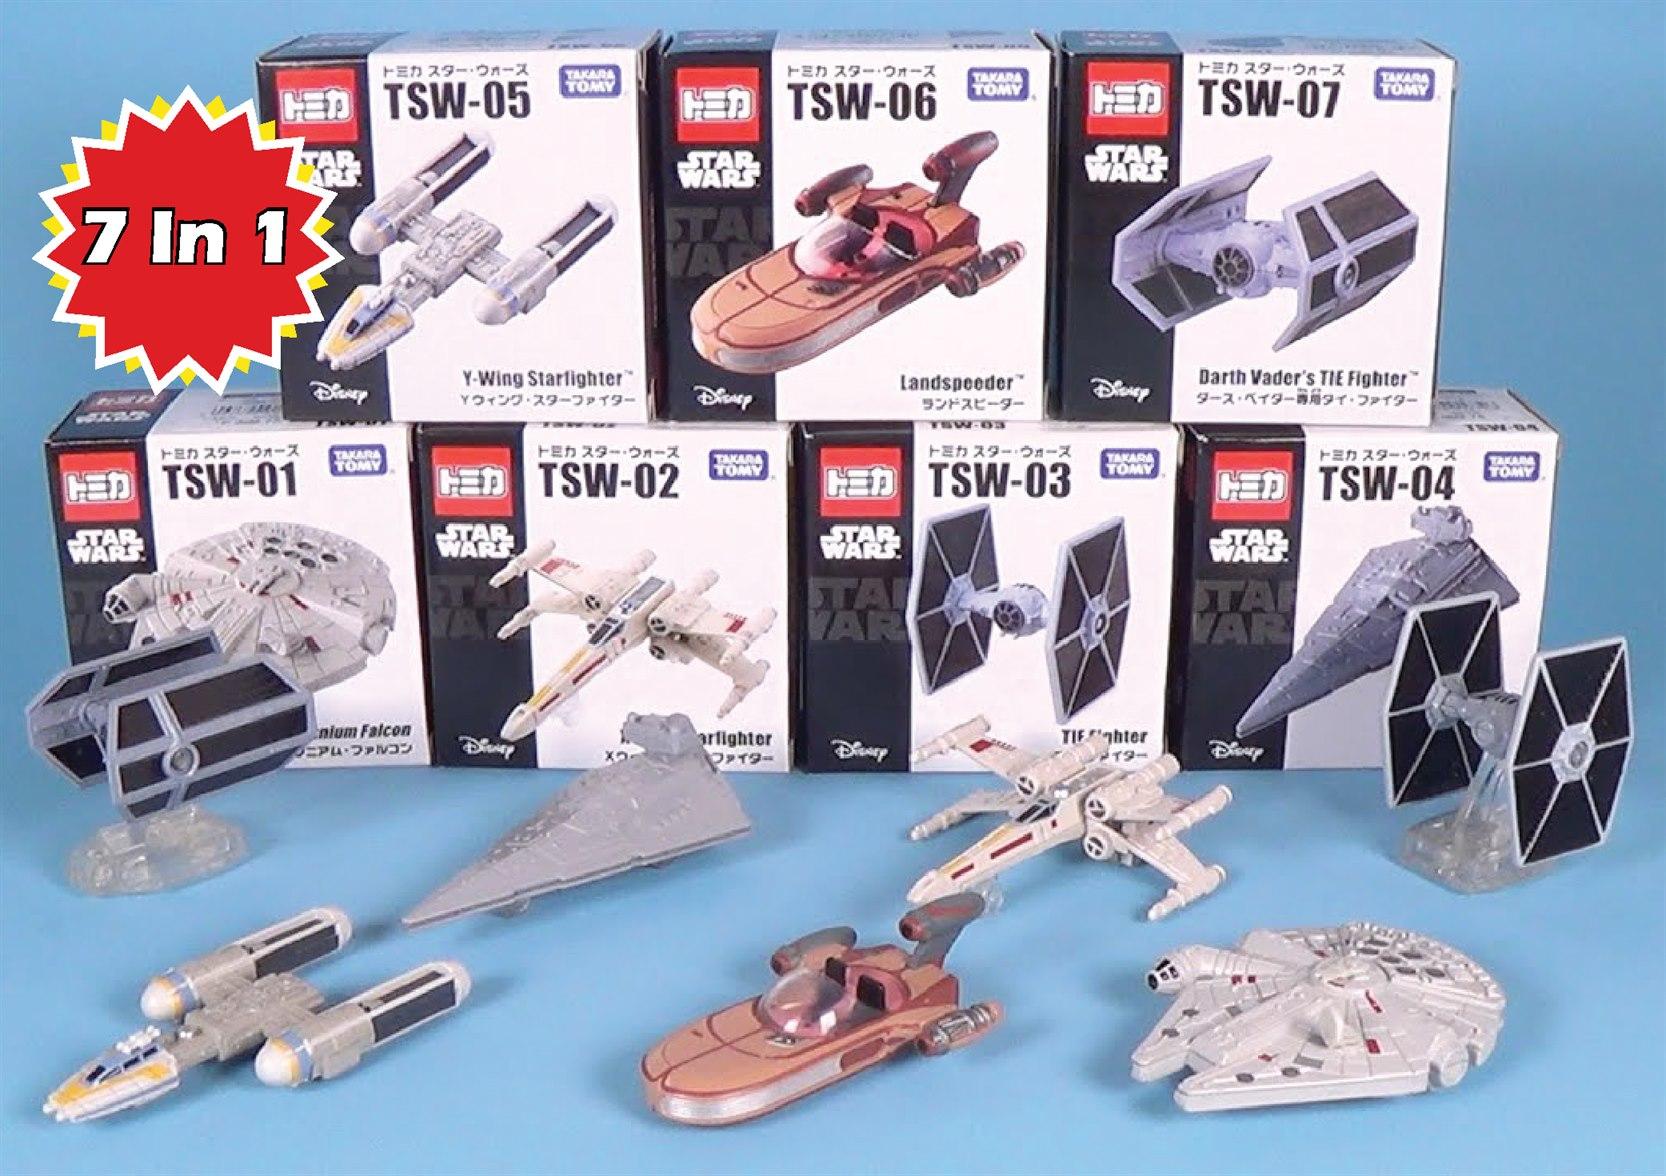 Tomica Star Wars Series TSW-01 Millennium Falcon by Takara Tomy Japan